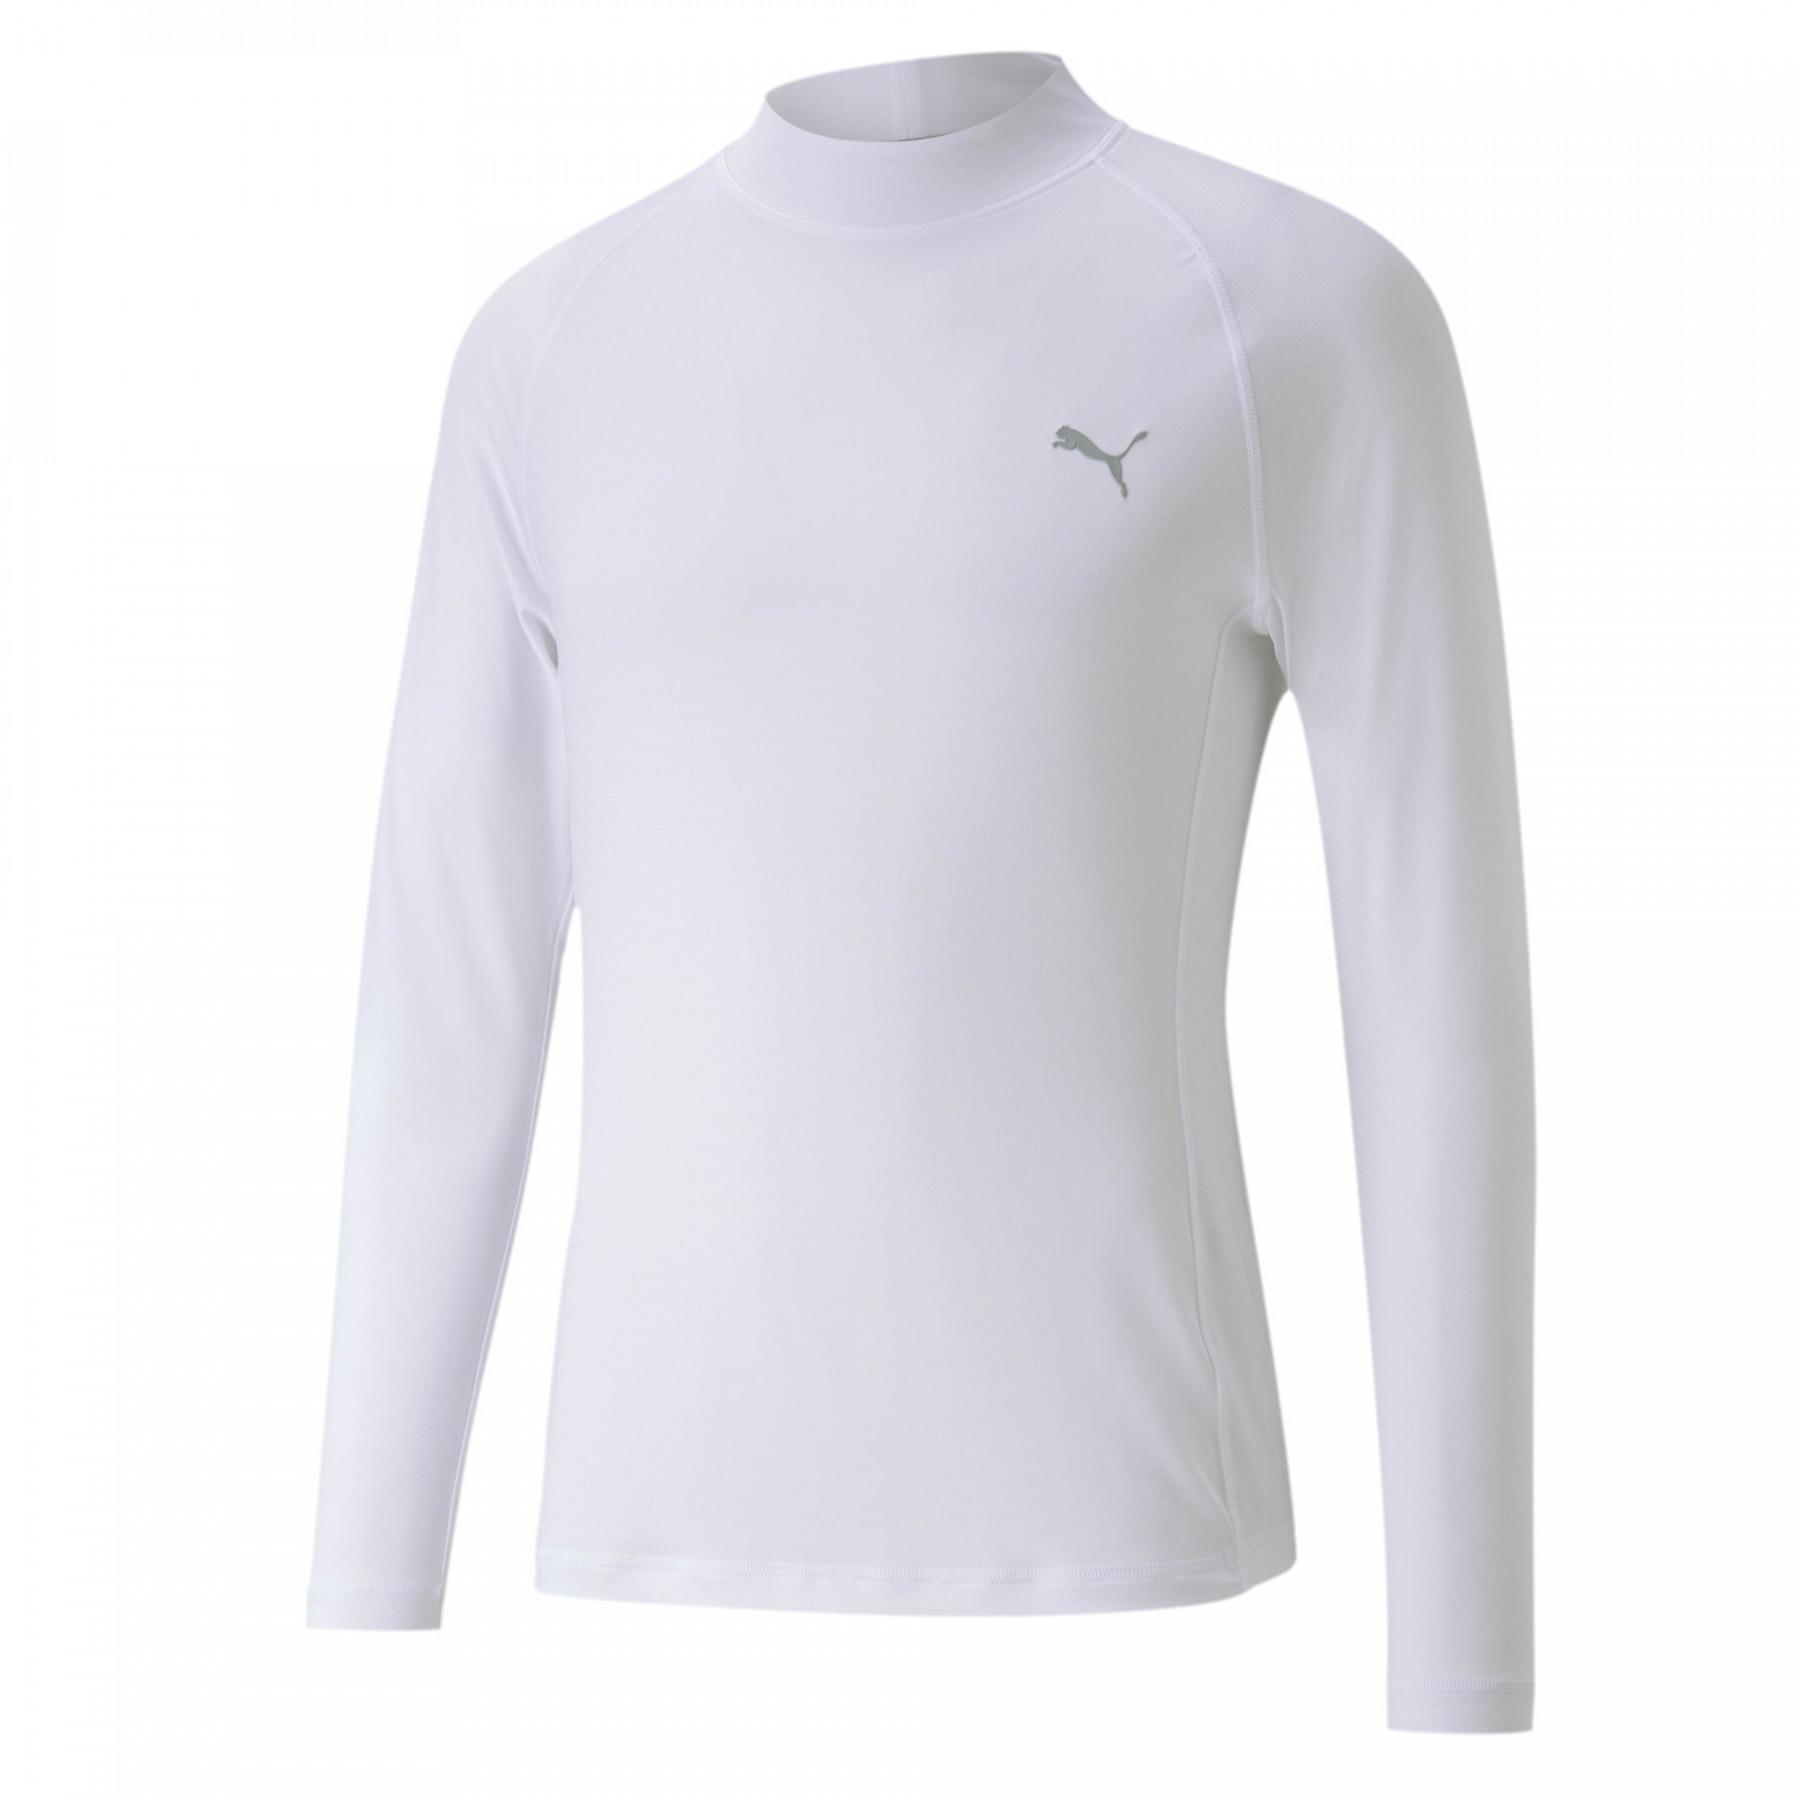 Puma Baselayer Sweatshirt